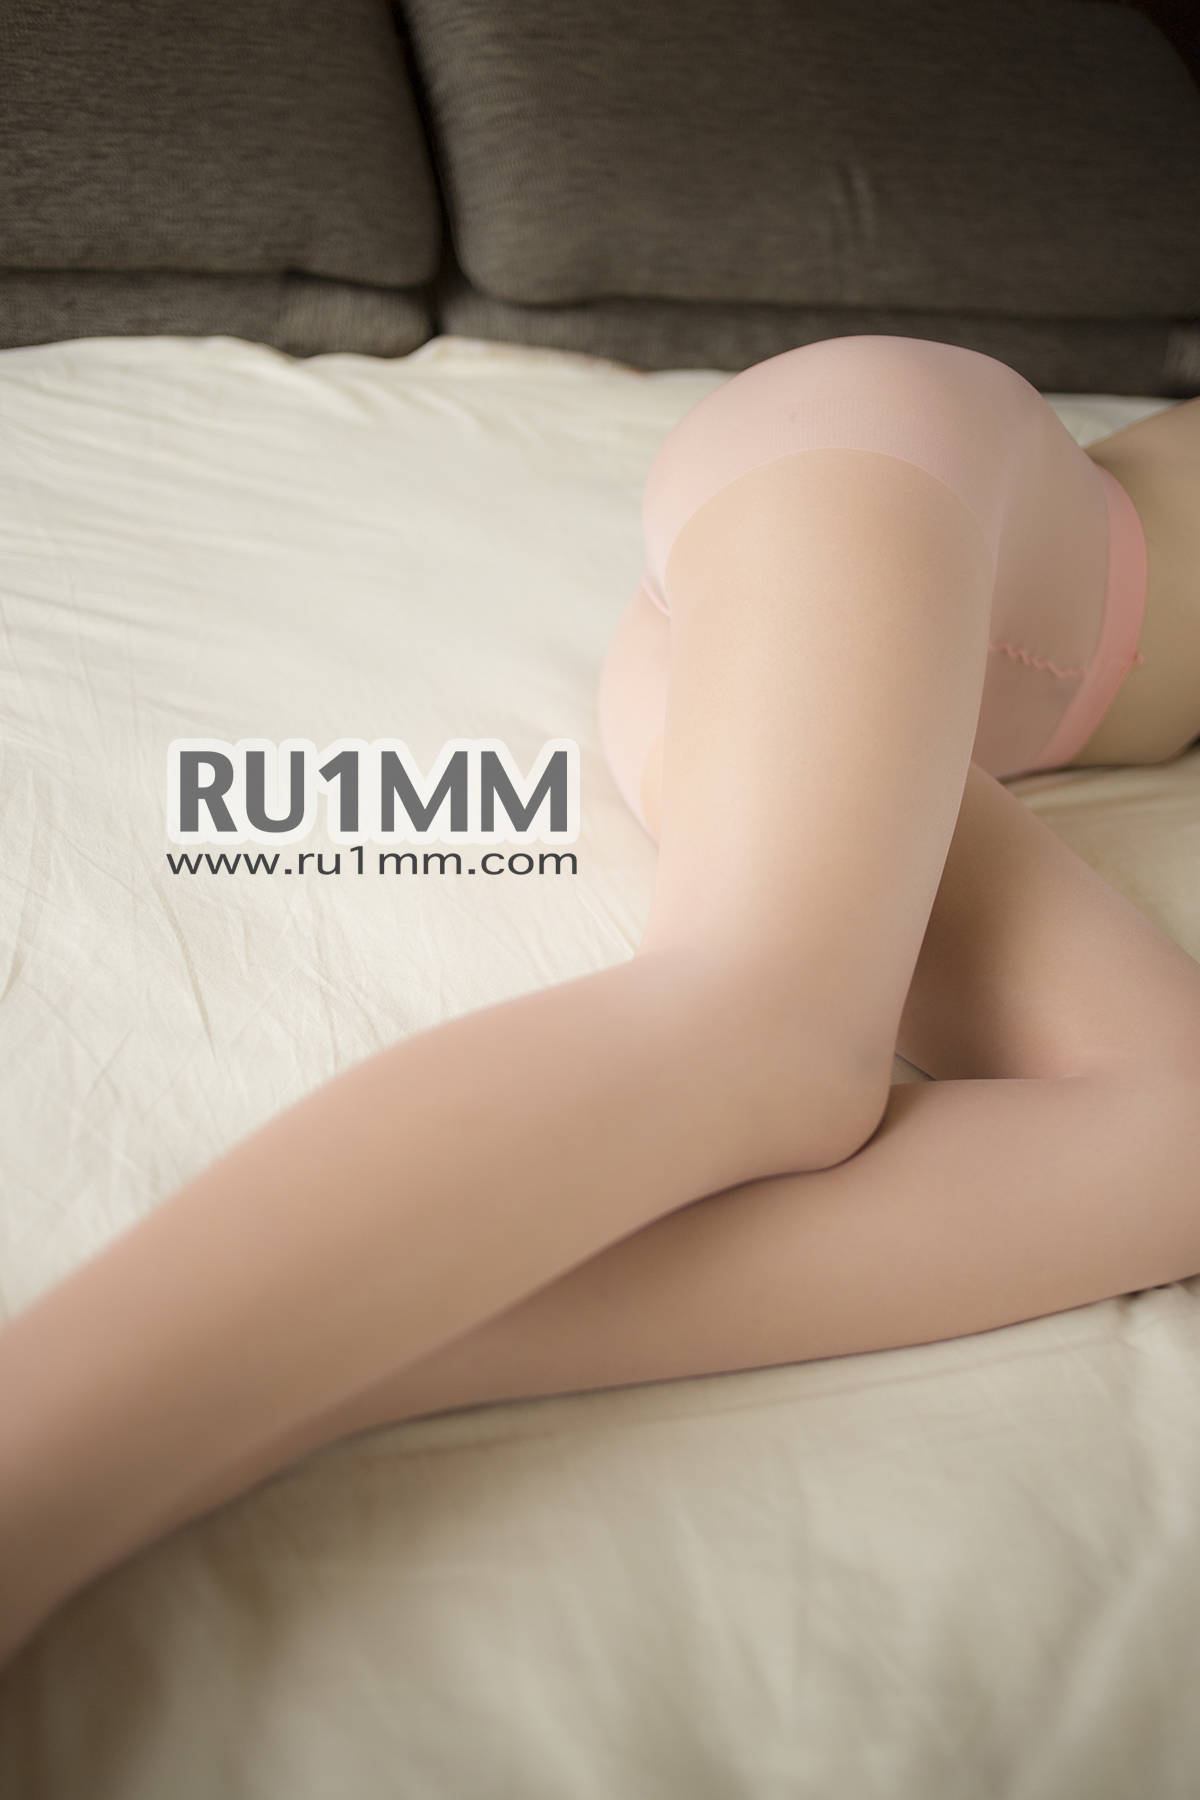 ru1mm-066-004.jpg